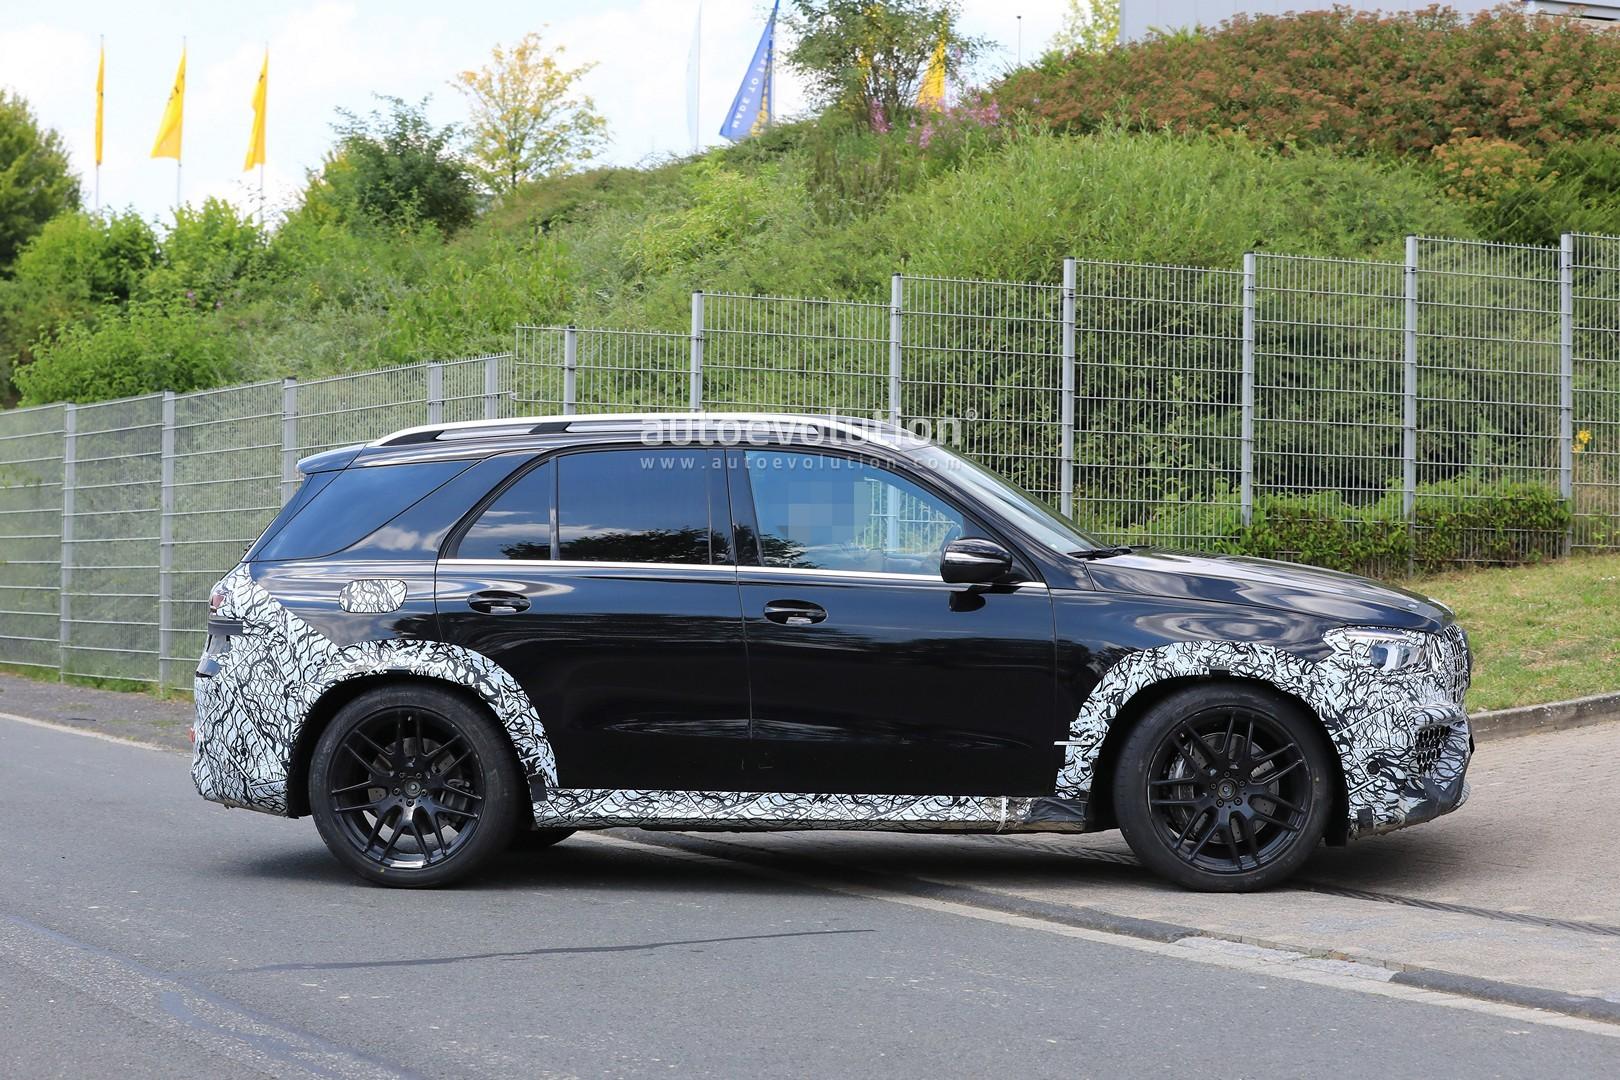 Spyshots: 2020 Mercedes-AMG GLE 63 Looks Chunky With Less ...